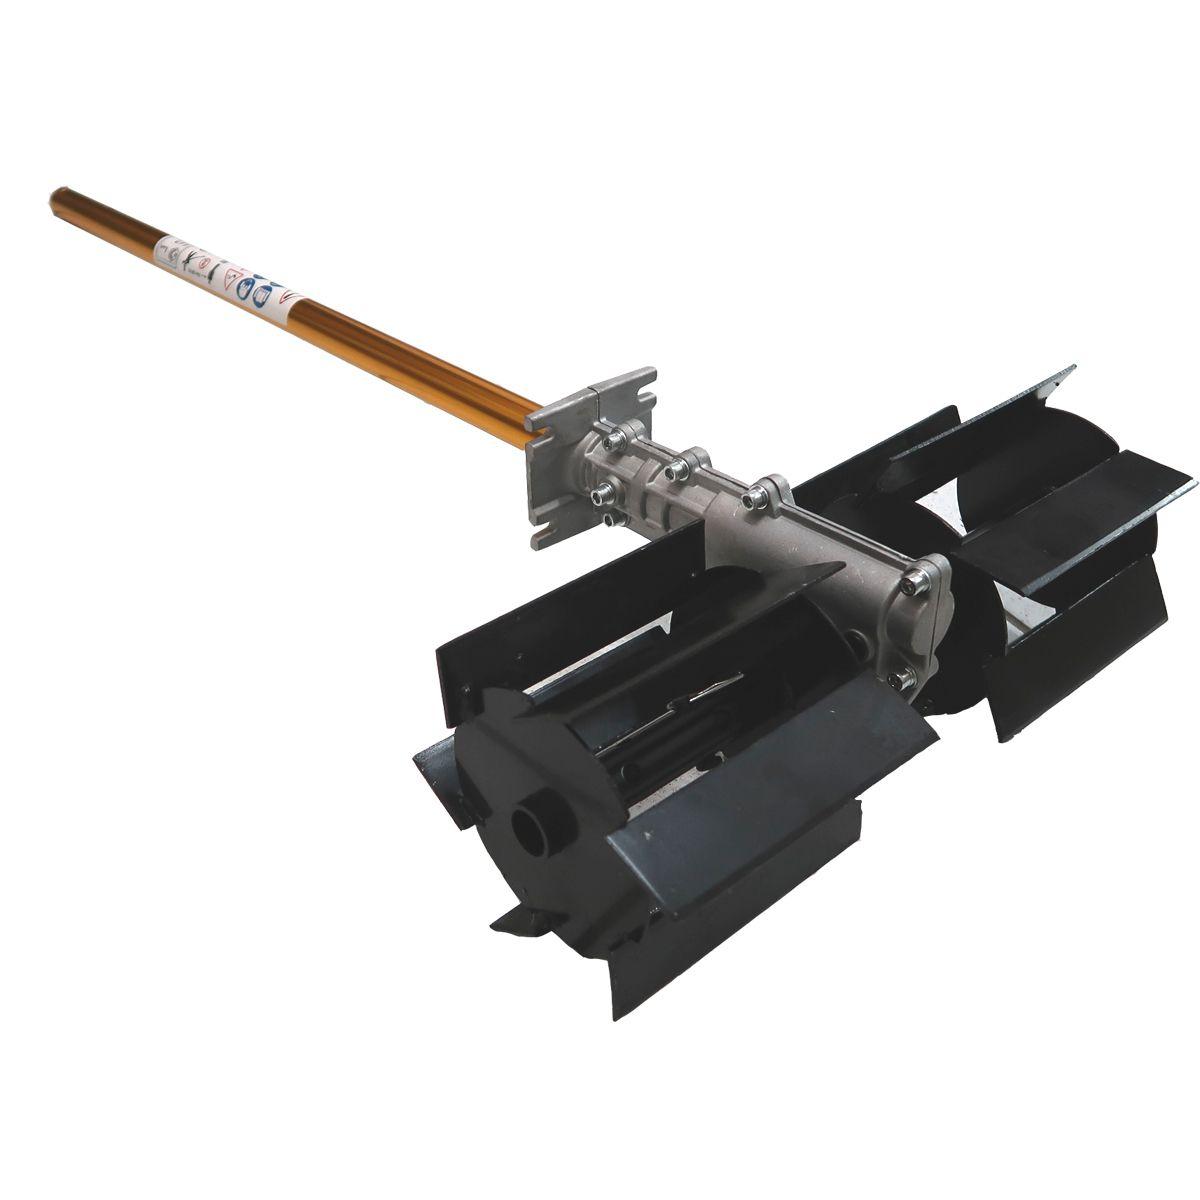 ROÇADEIRA DAKK RC620 - TORK MONSTER COM ENXADA ROTATIVA